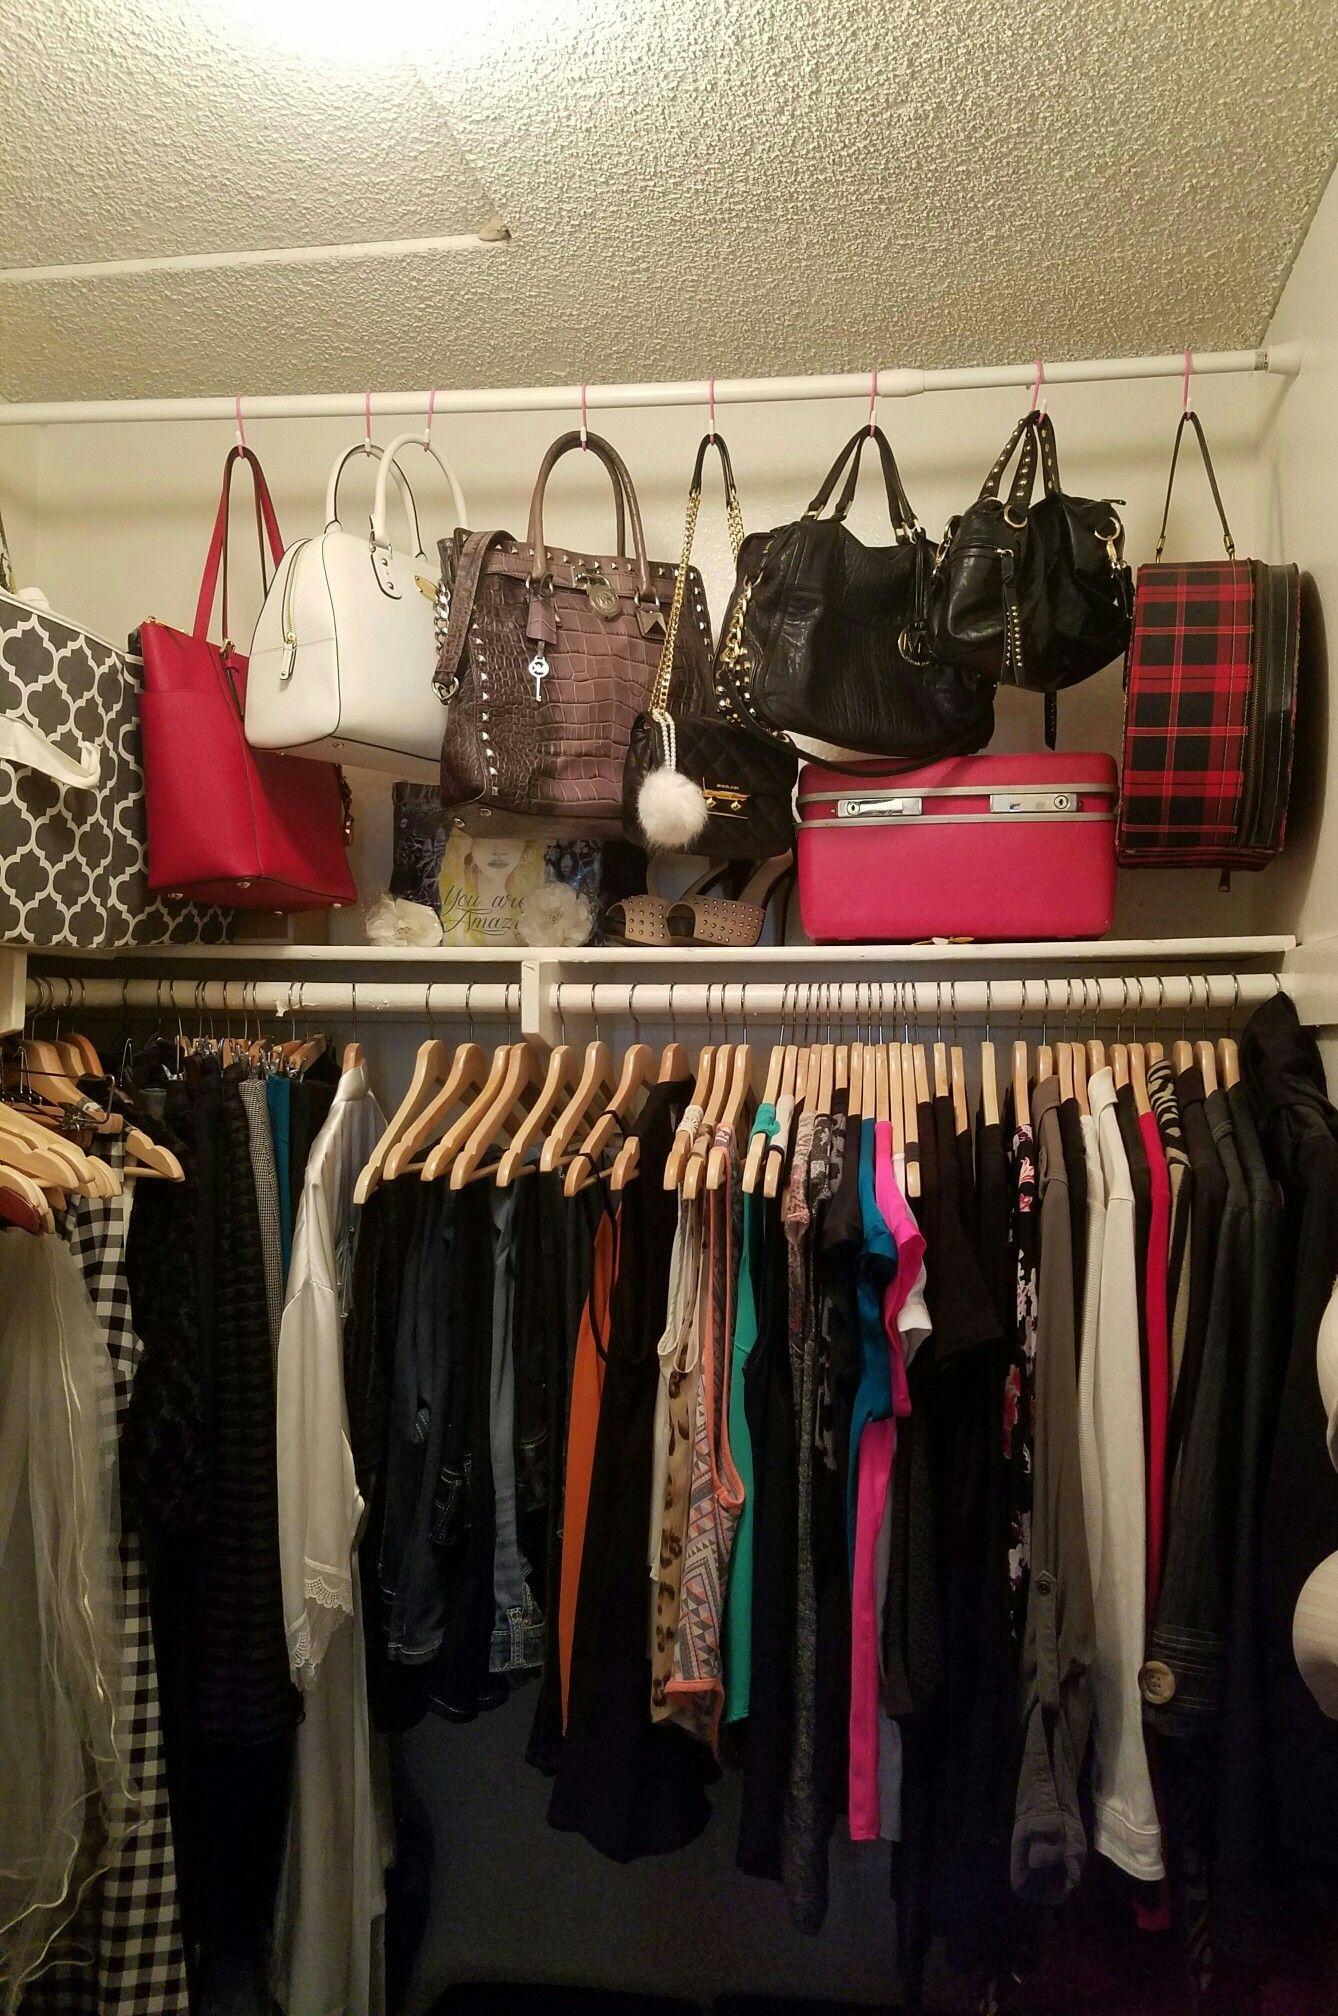 How To Dislay Handbags In Your Closet. Organize Purses. #organizecloset